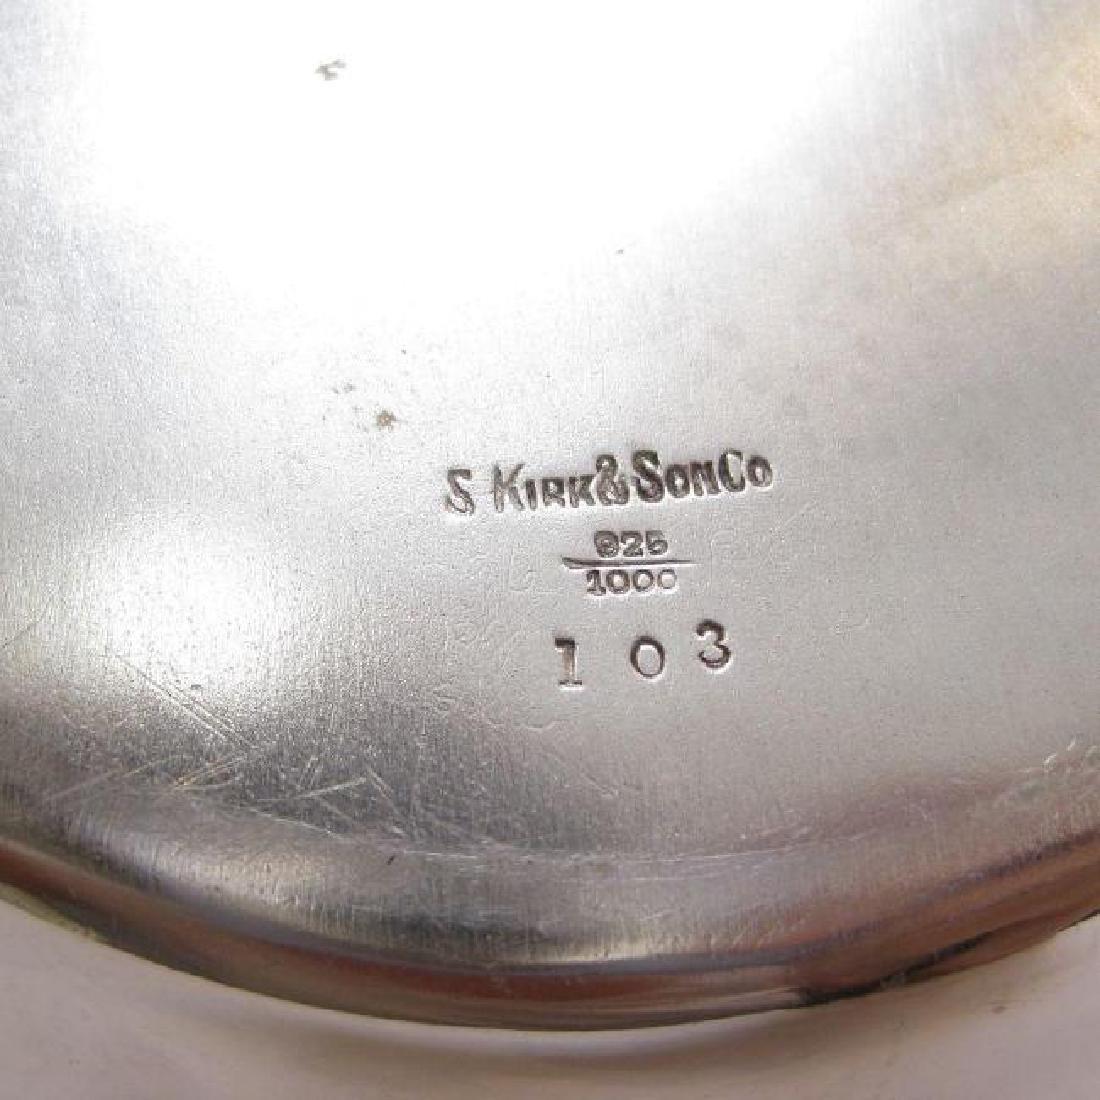 Antique Kirk & Son Sterling Silver Floral Repousse Bowl - 2